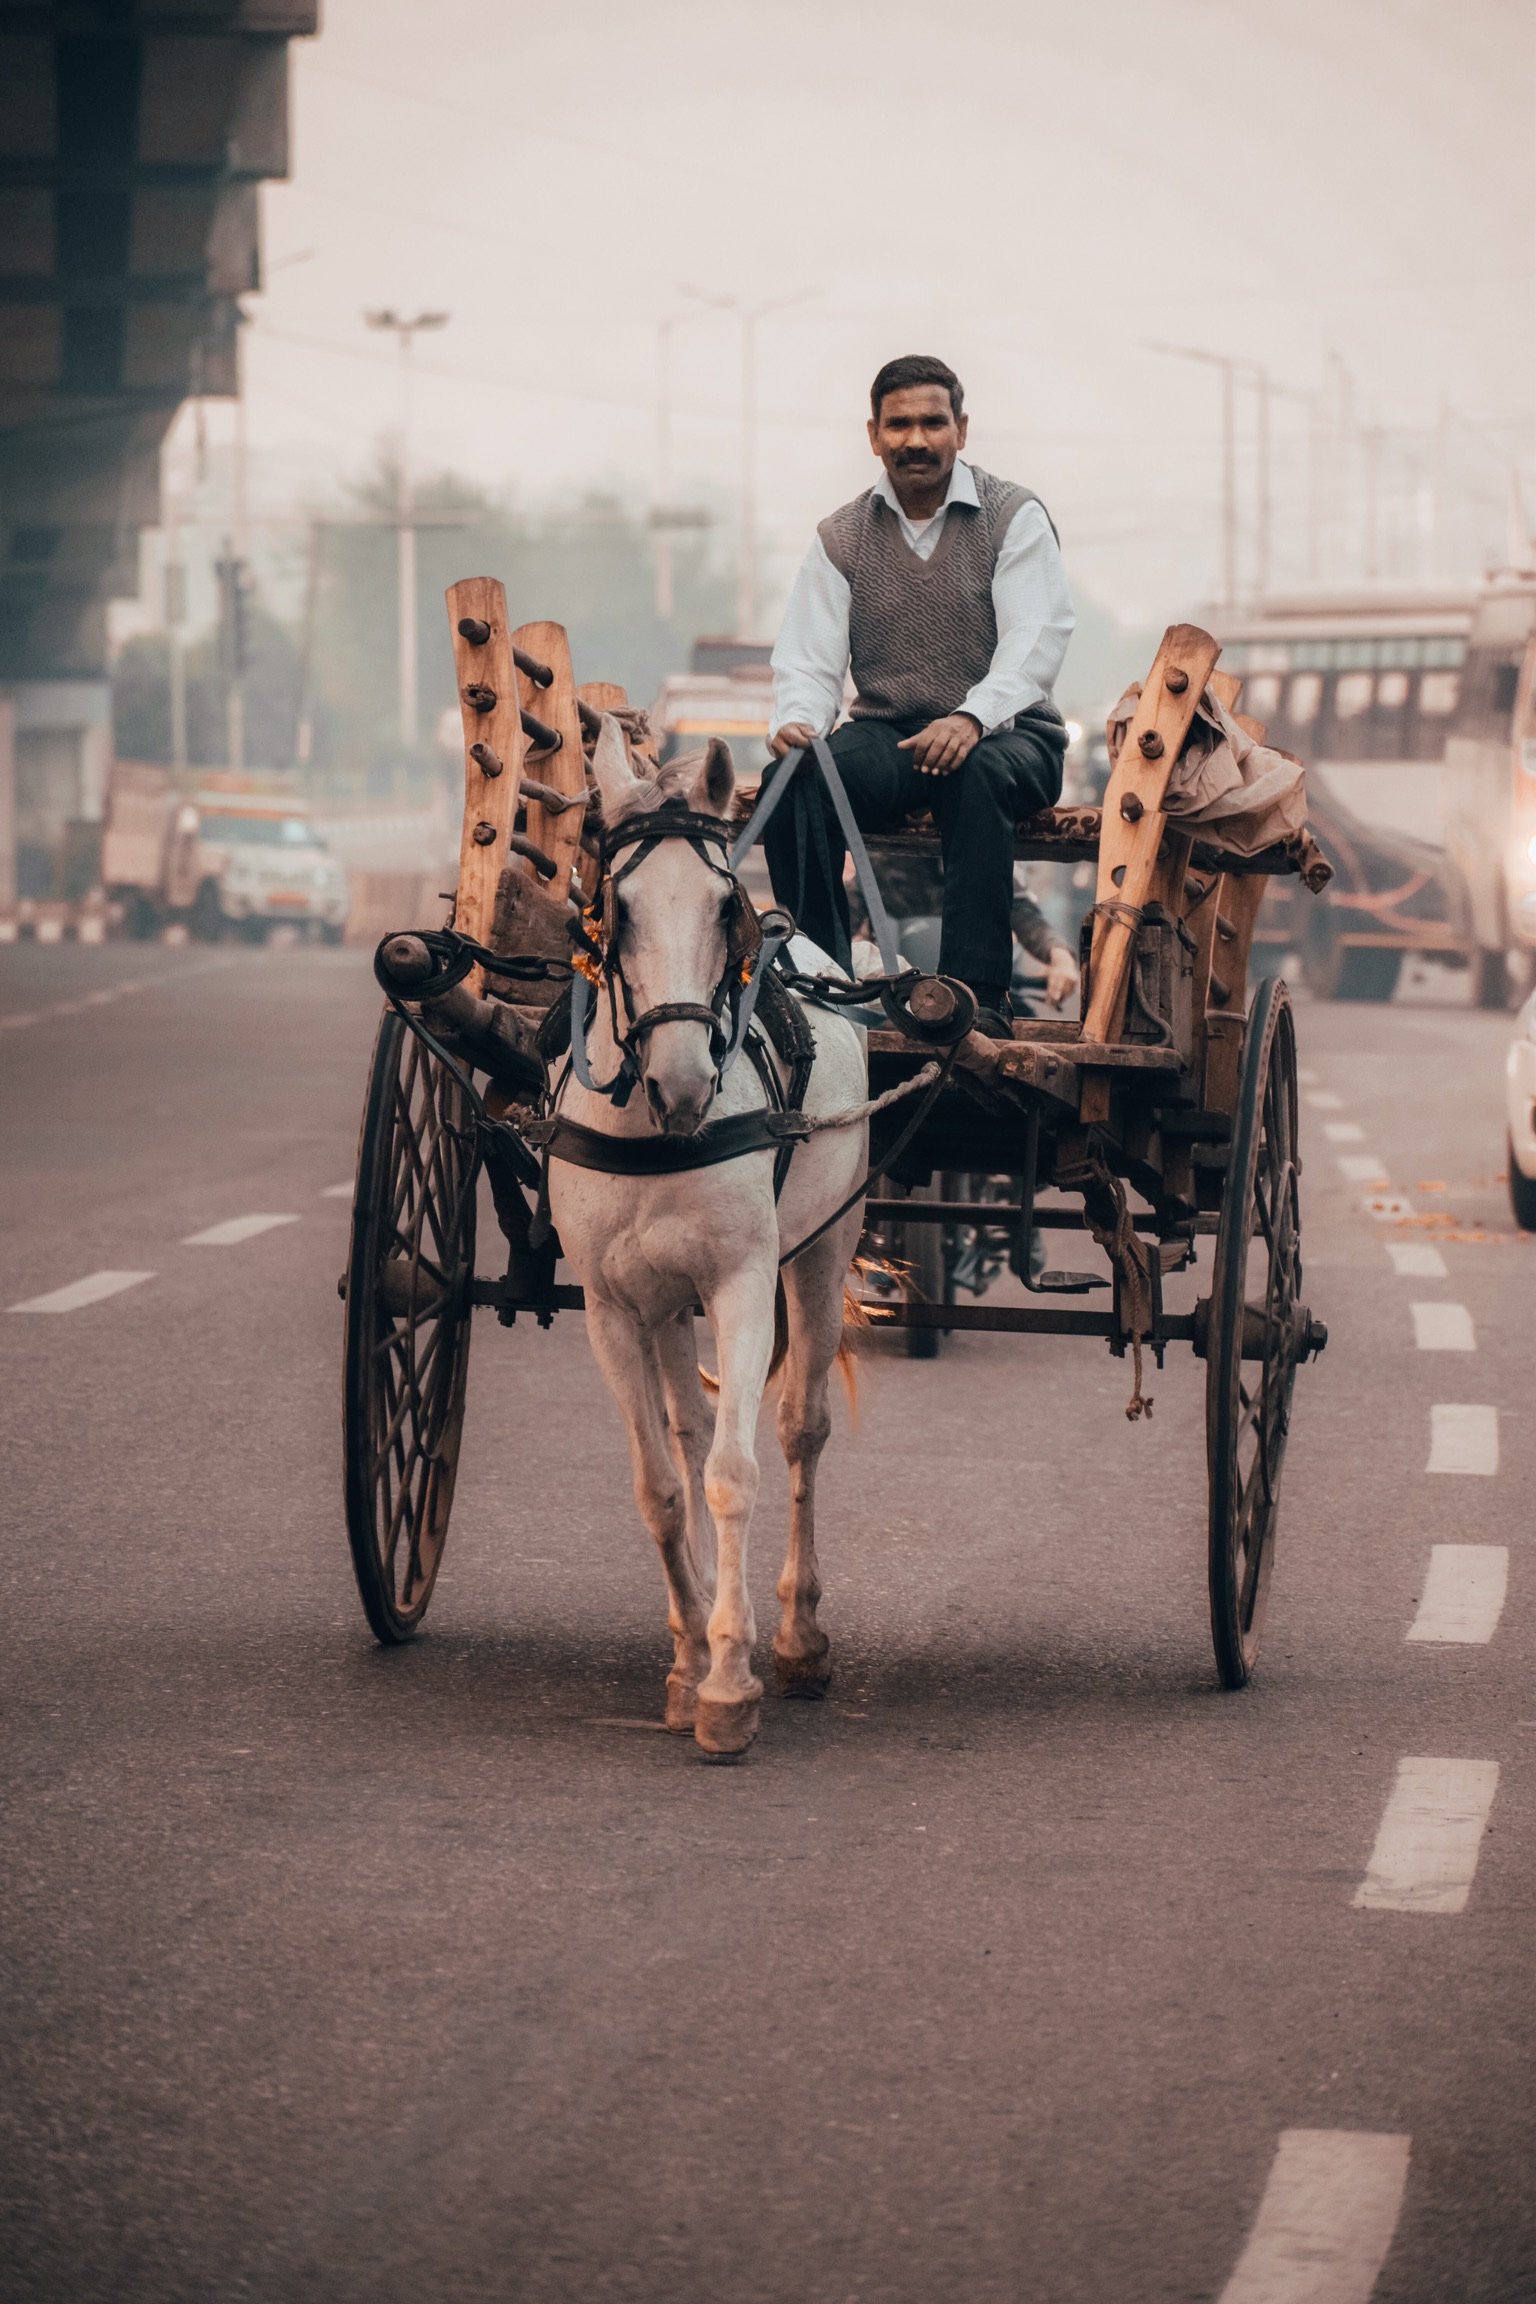 A man on horse cart